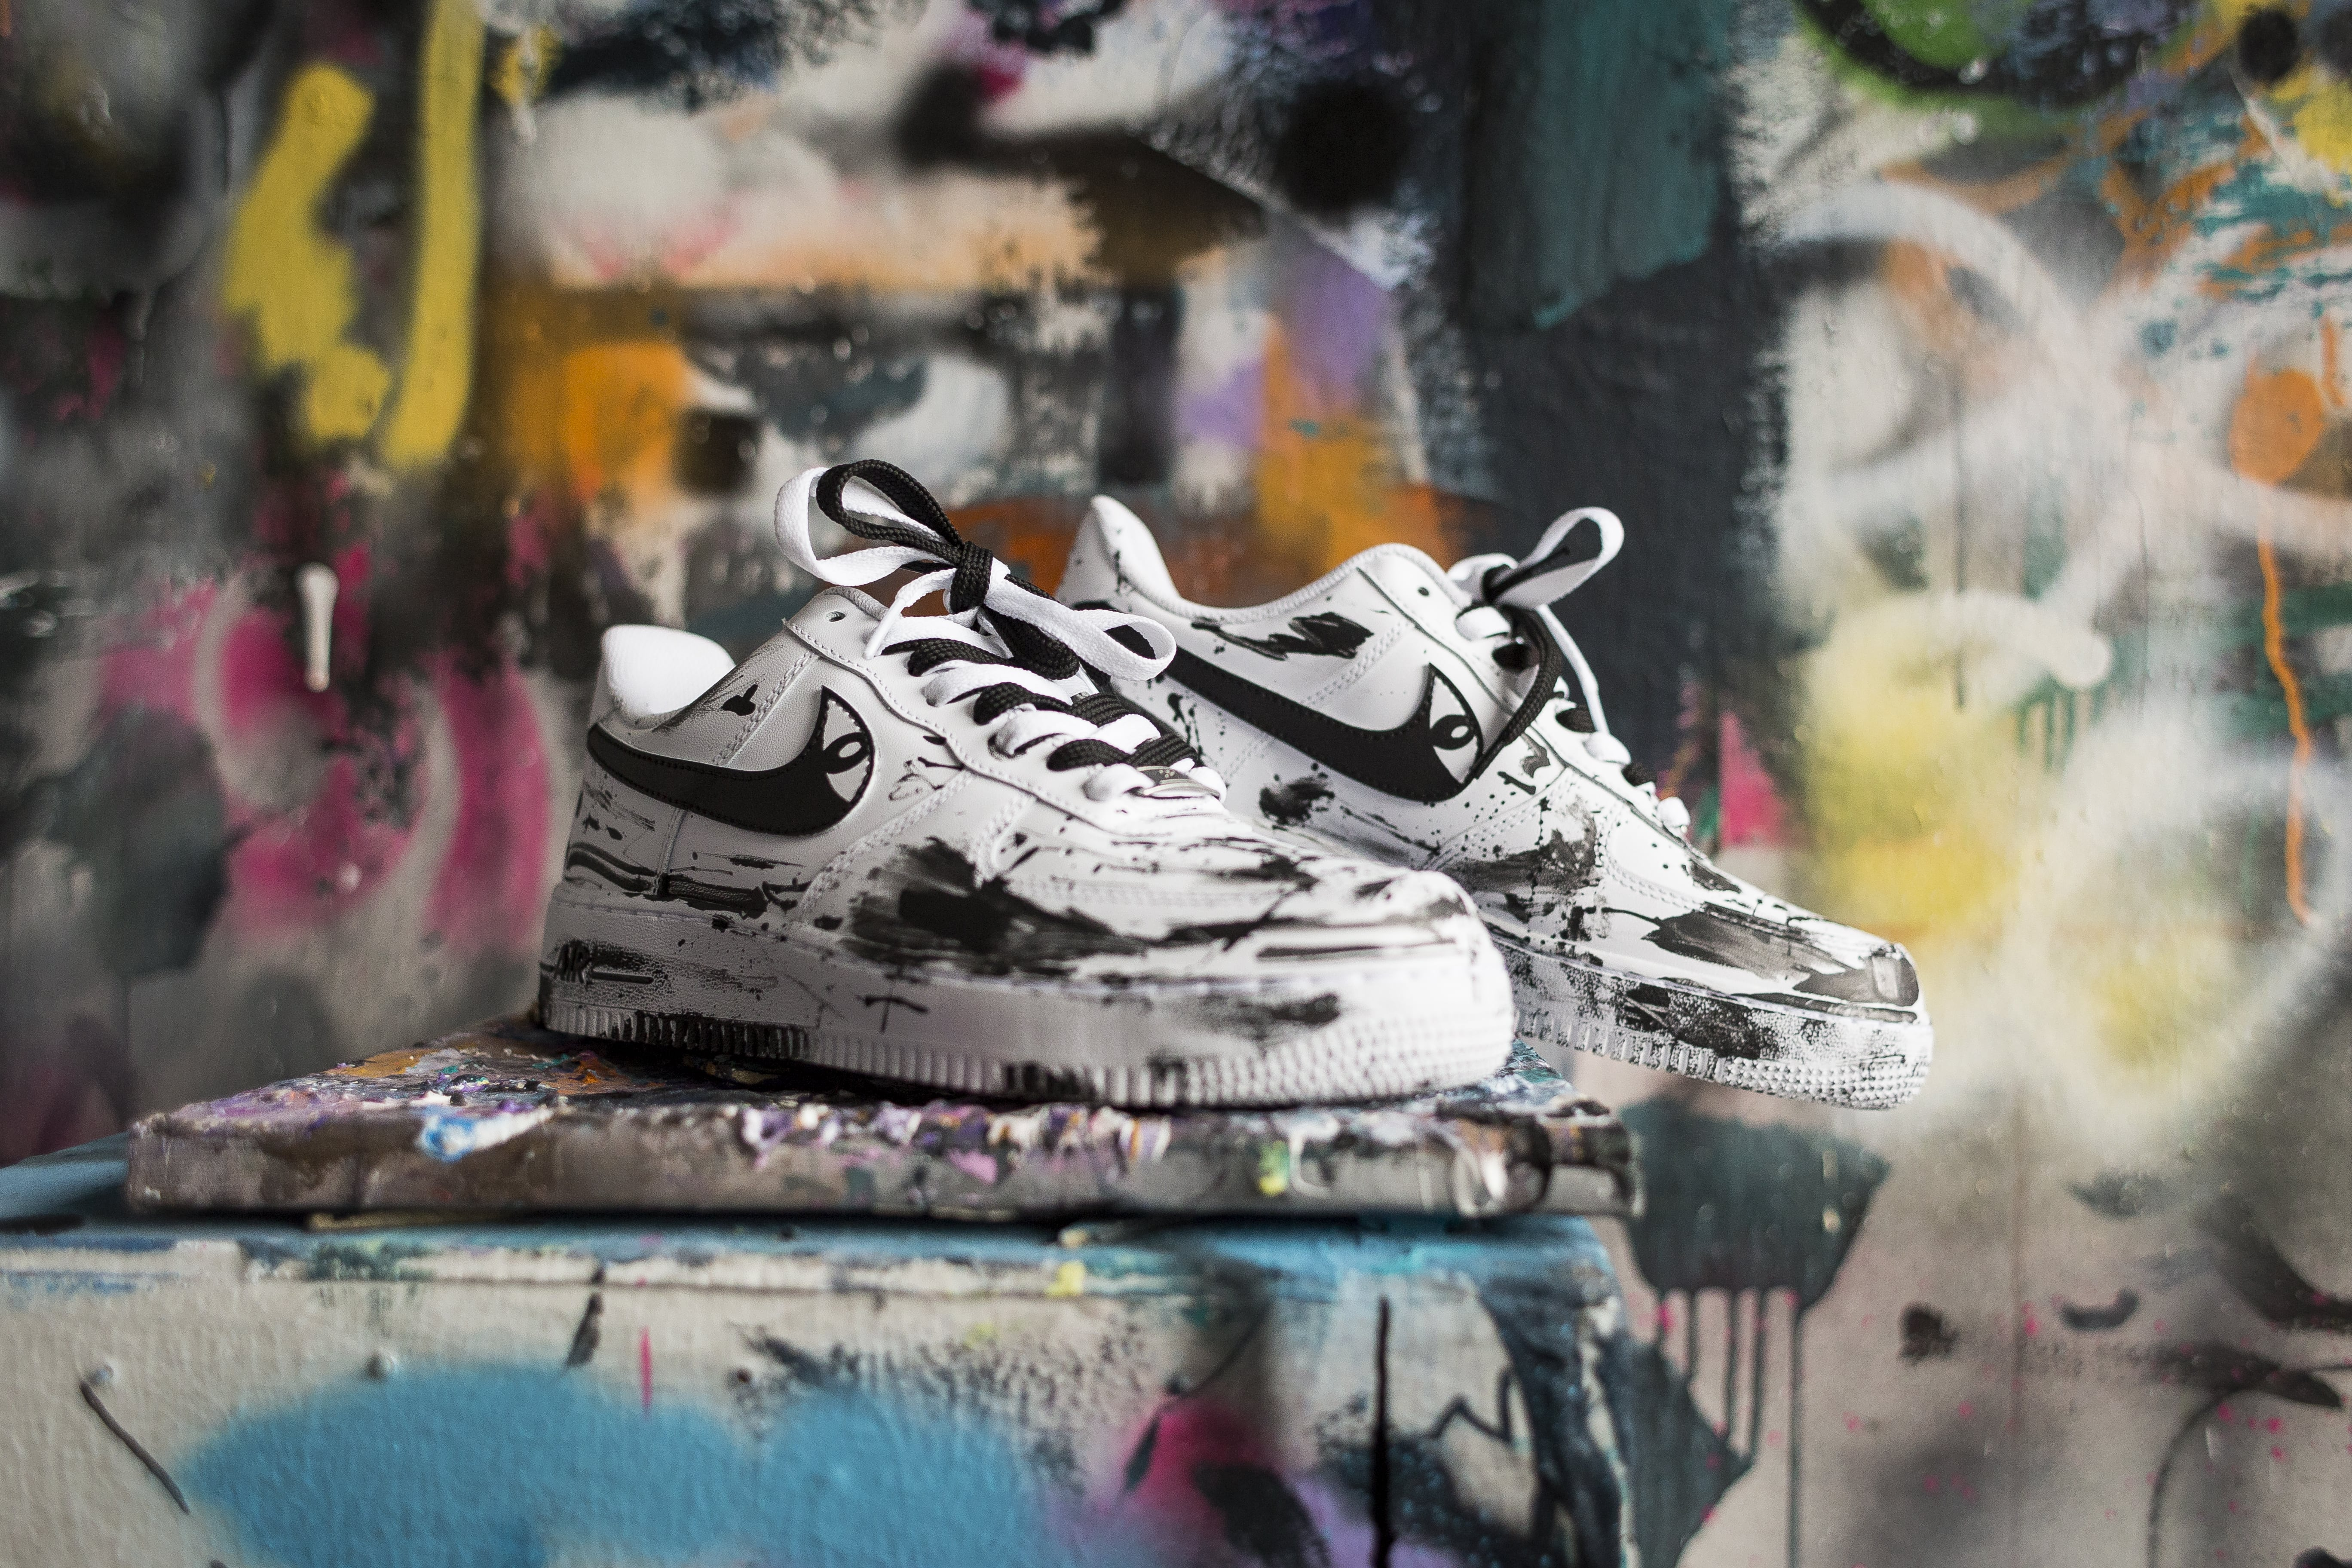 Nike Air Force Low Noriaki